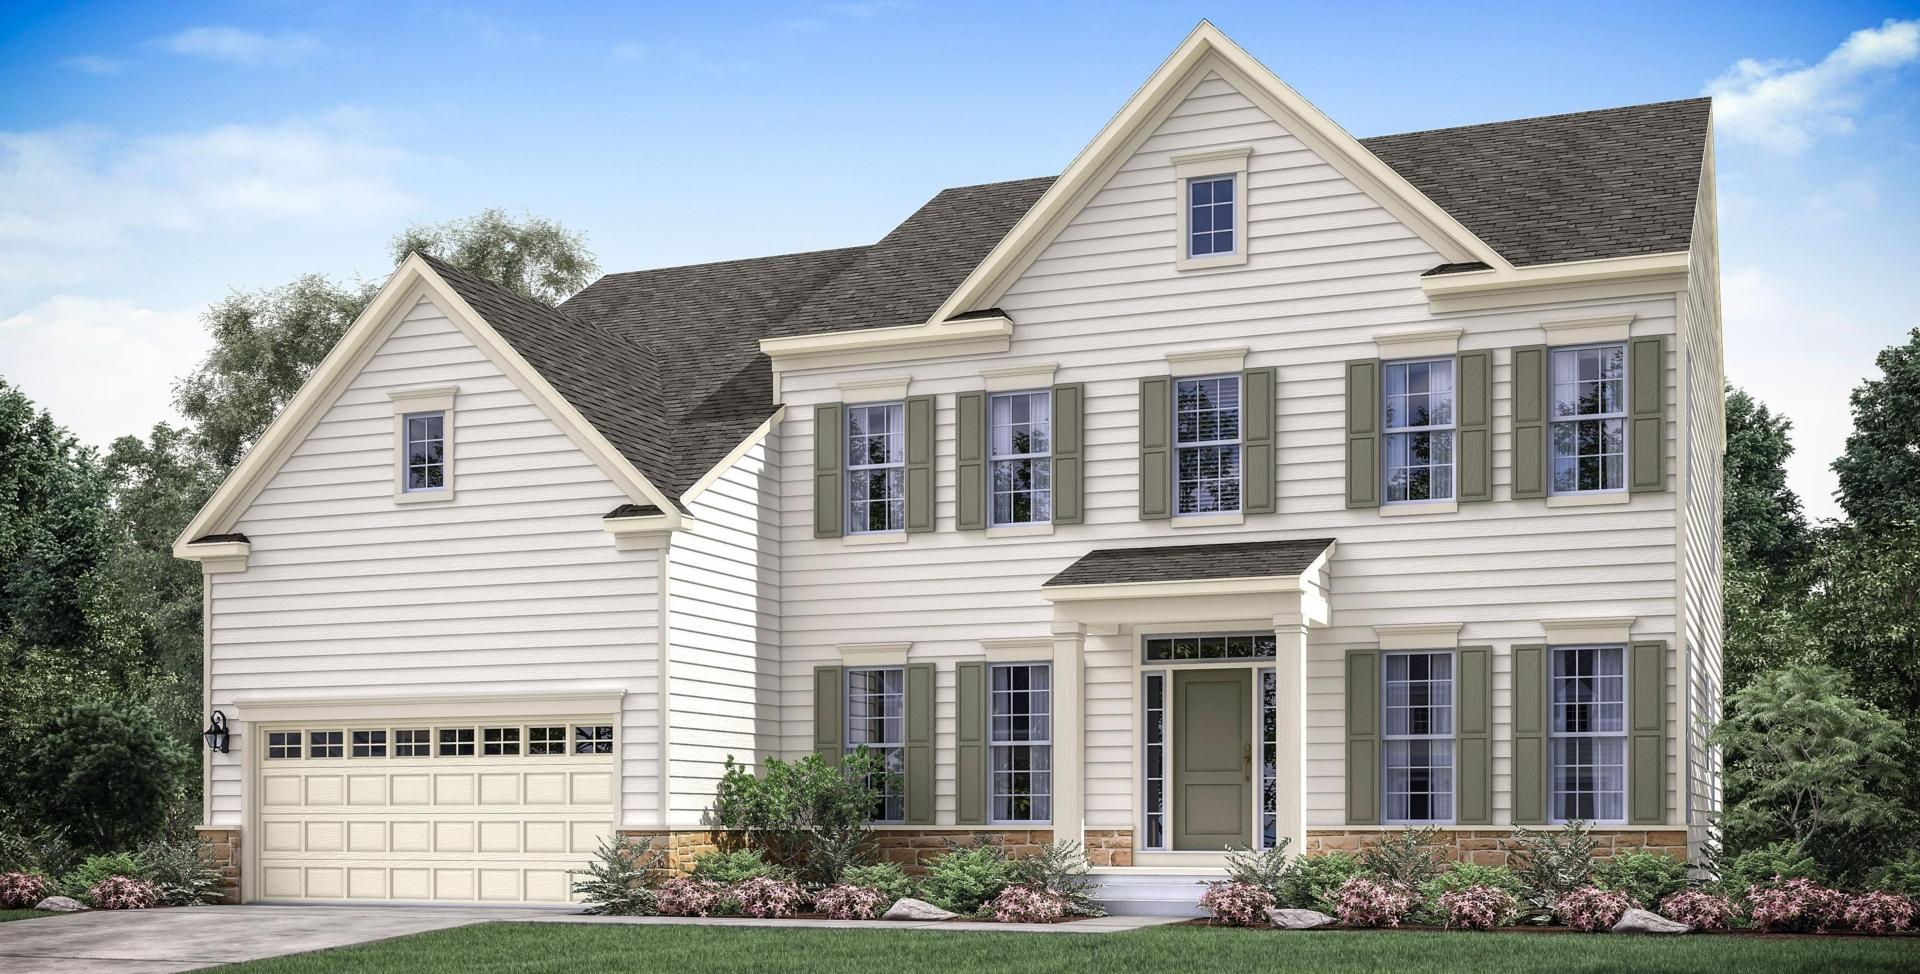 Single family home in md va lugano mid atlantic builders for Mid atlantic home builders